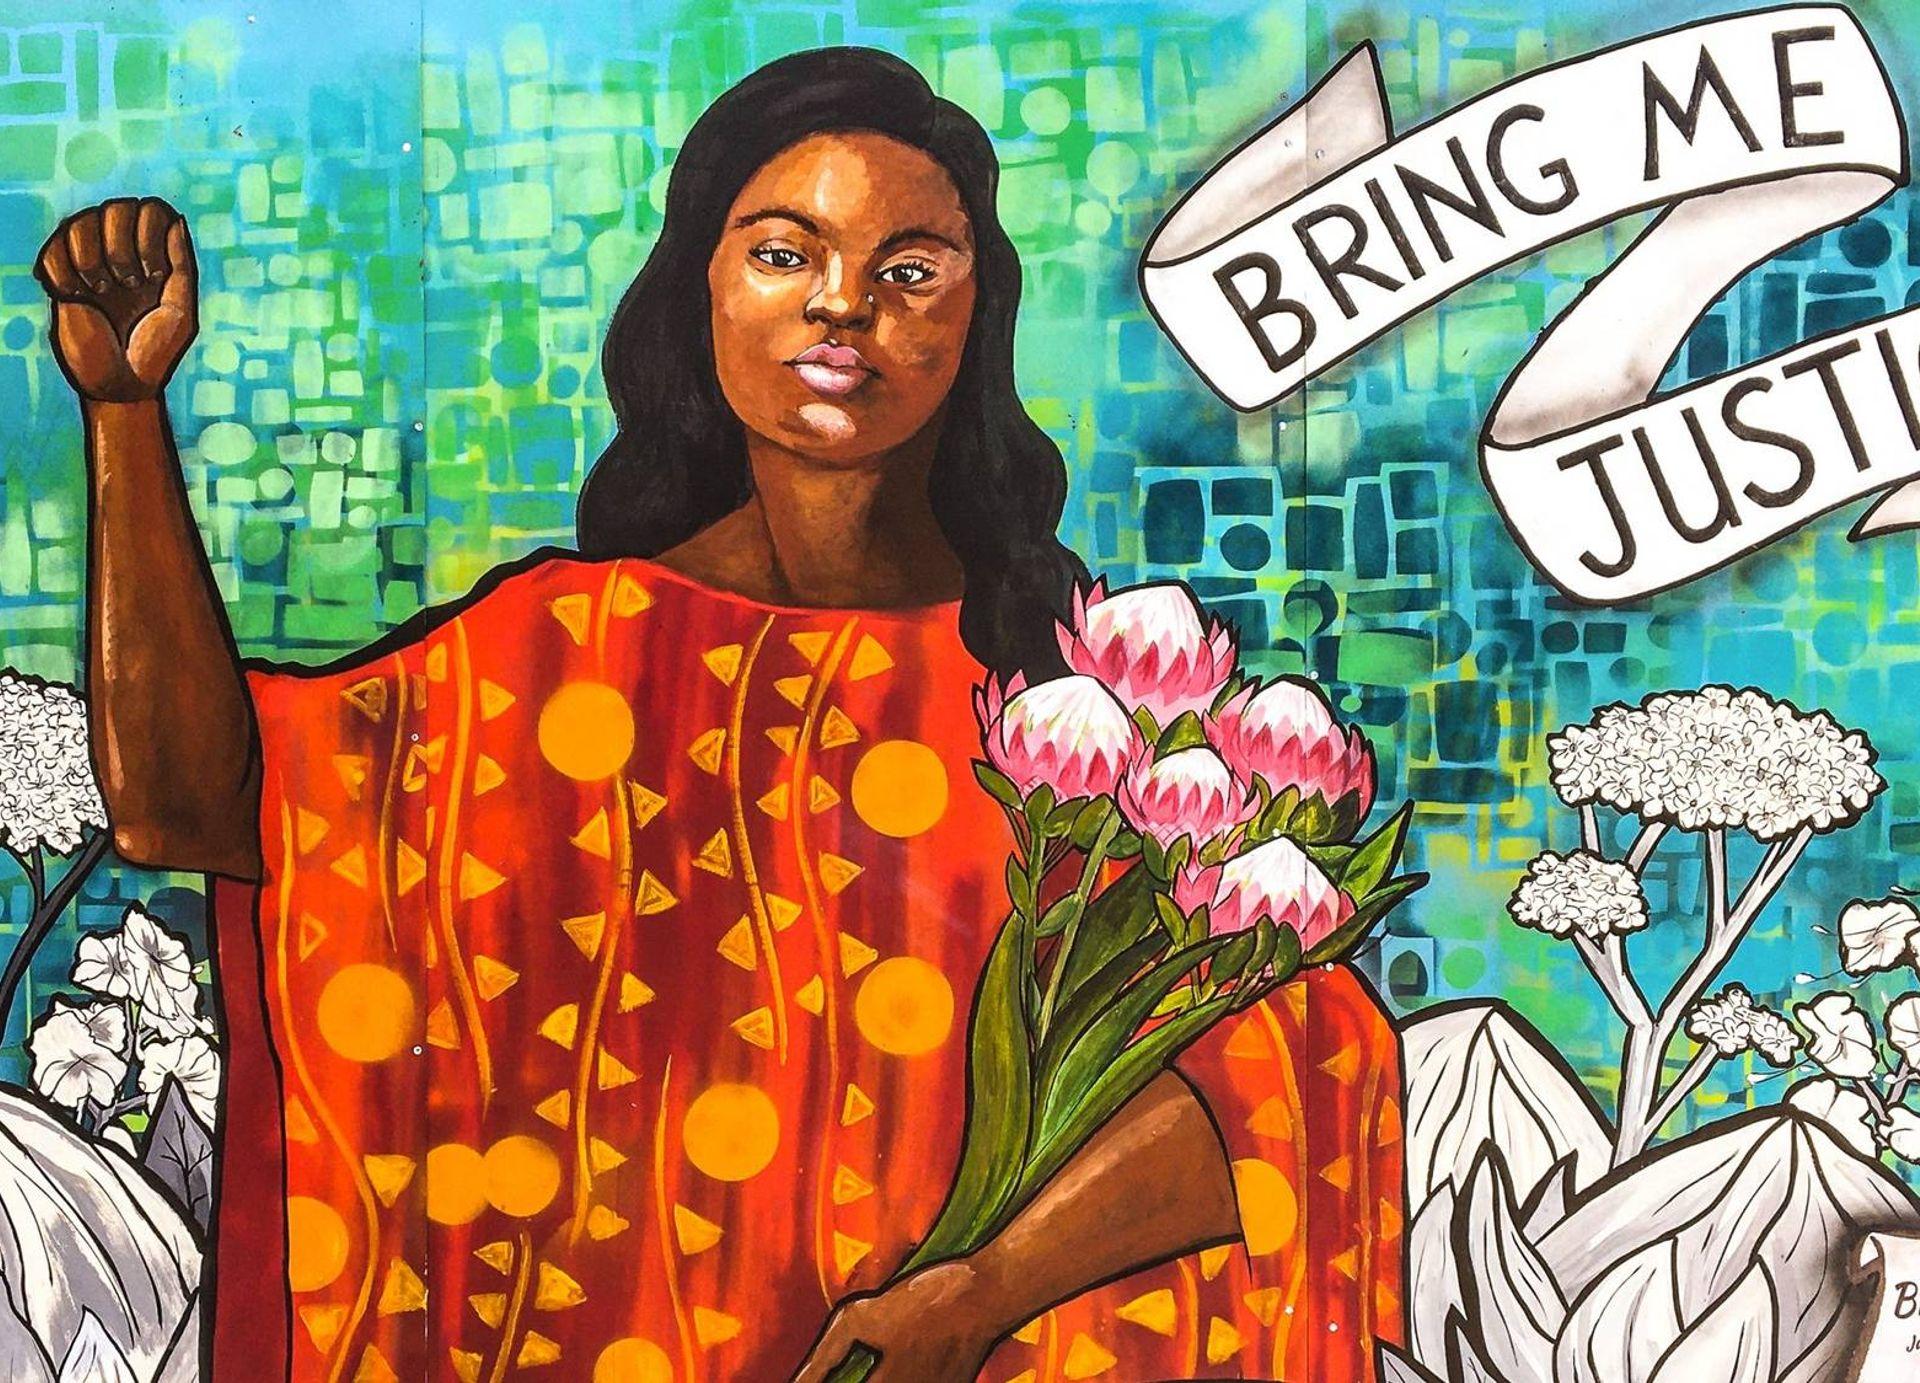 Mural of Breonna Taylor in Oakland California